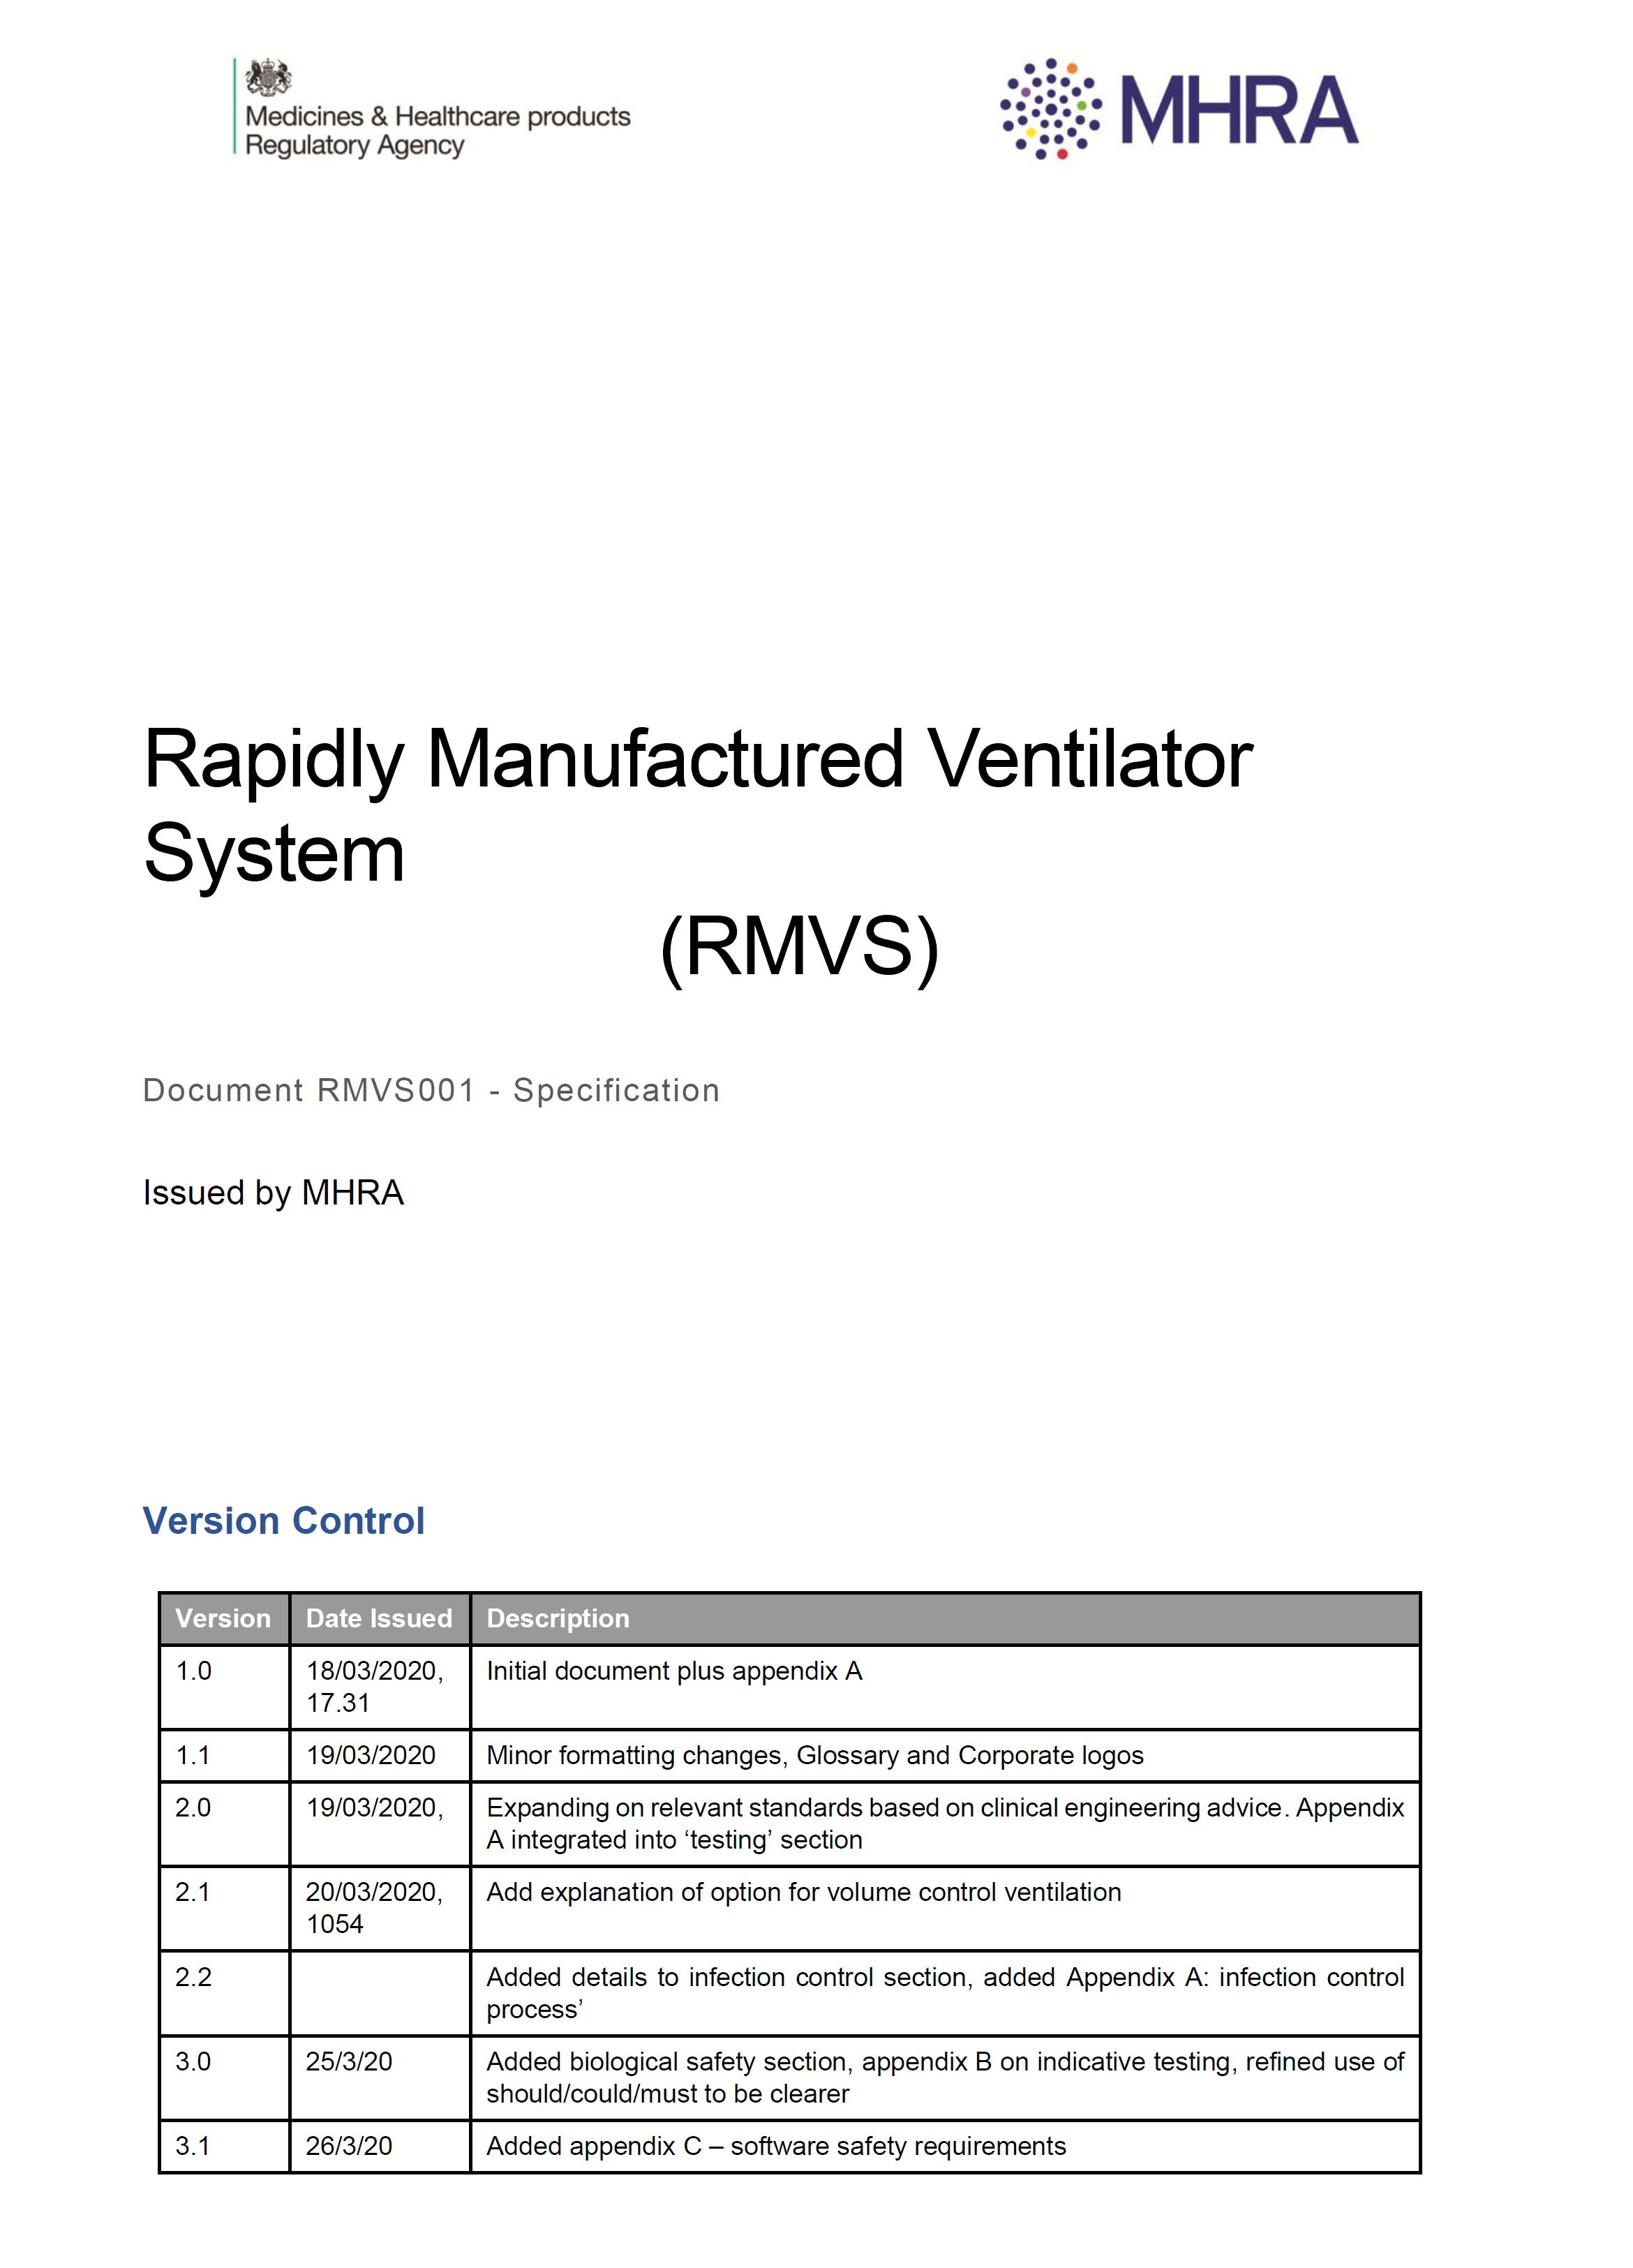 MHRA Rapidly Manufactured Ventilator System Spec